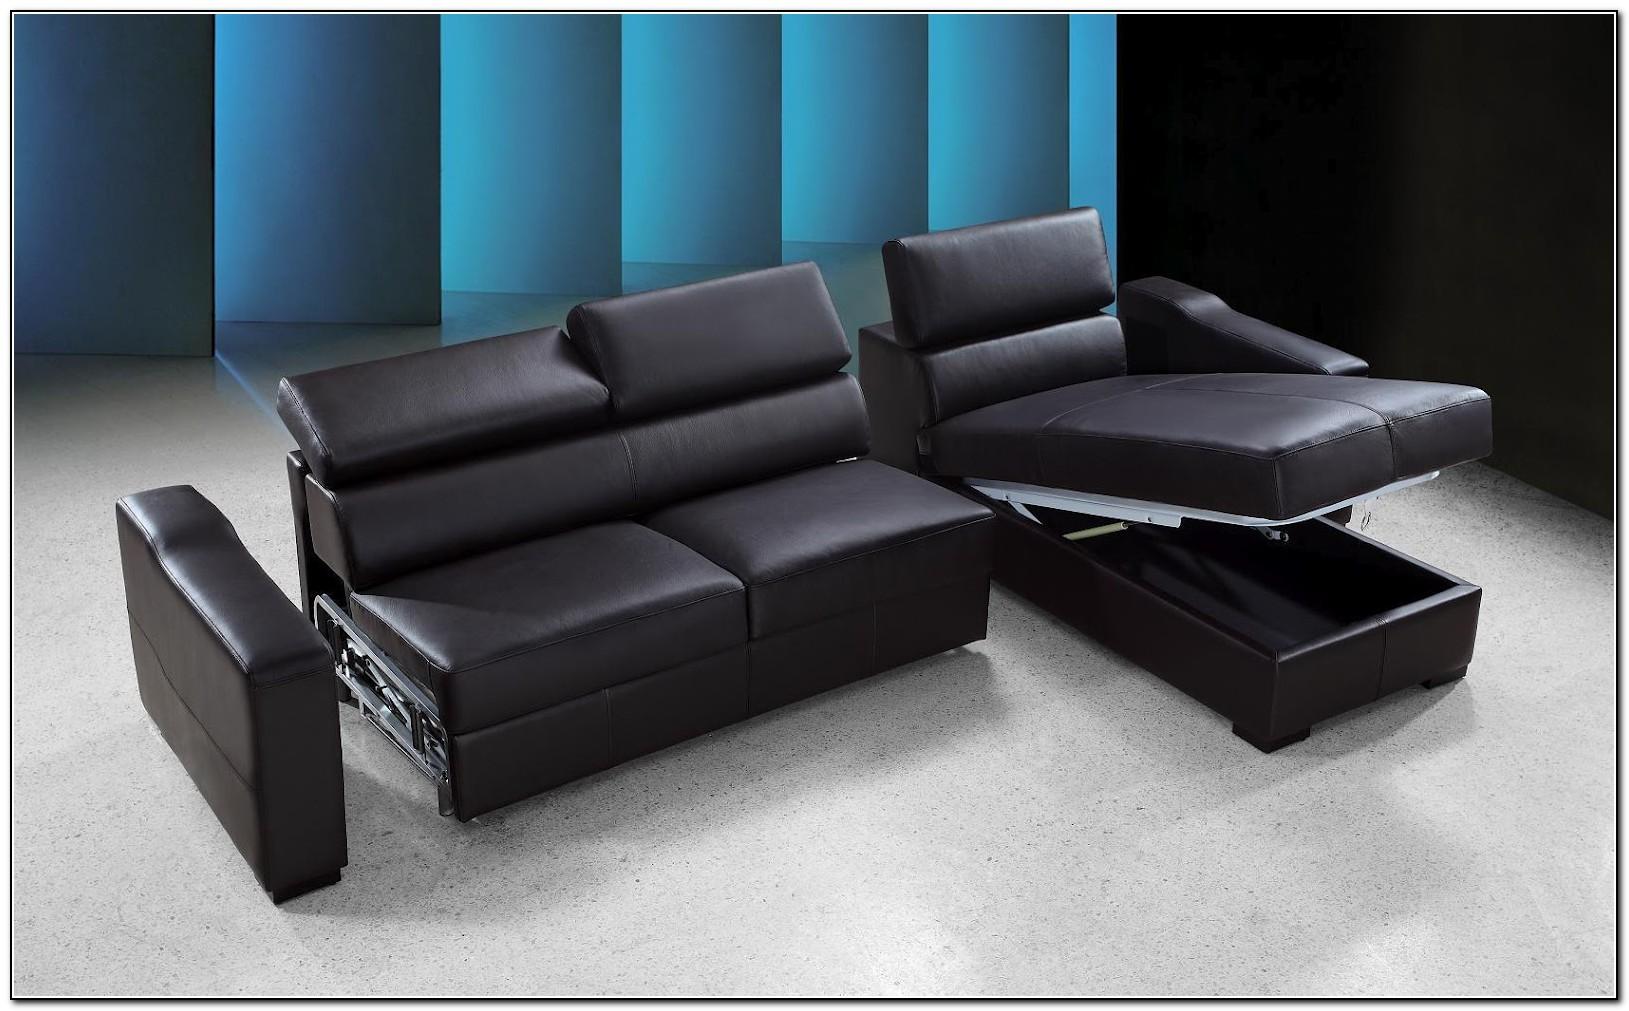 Ikea Sectional Sofa With Storage